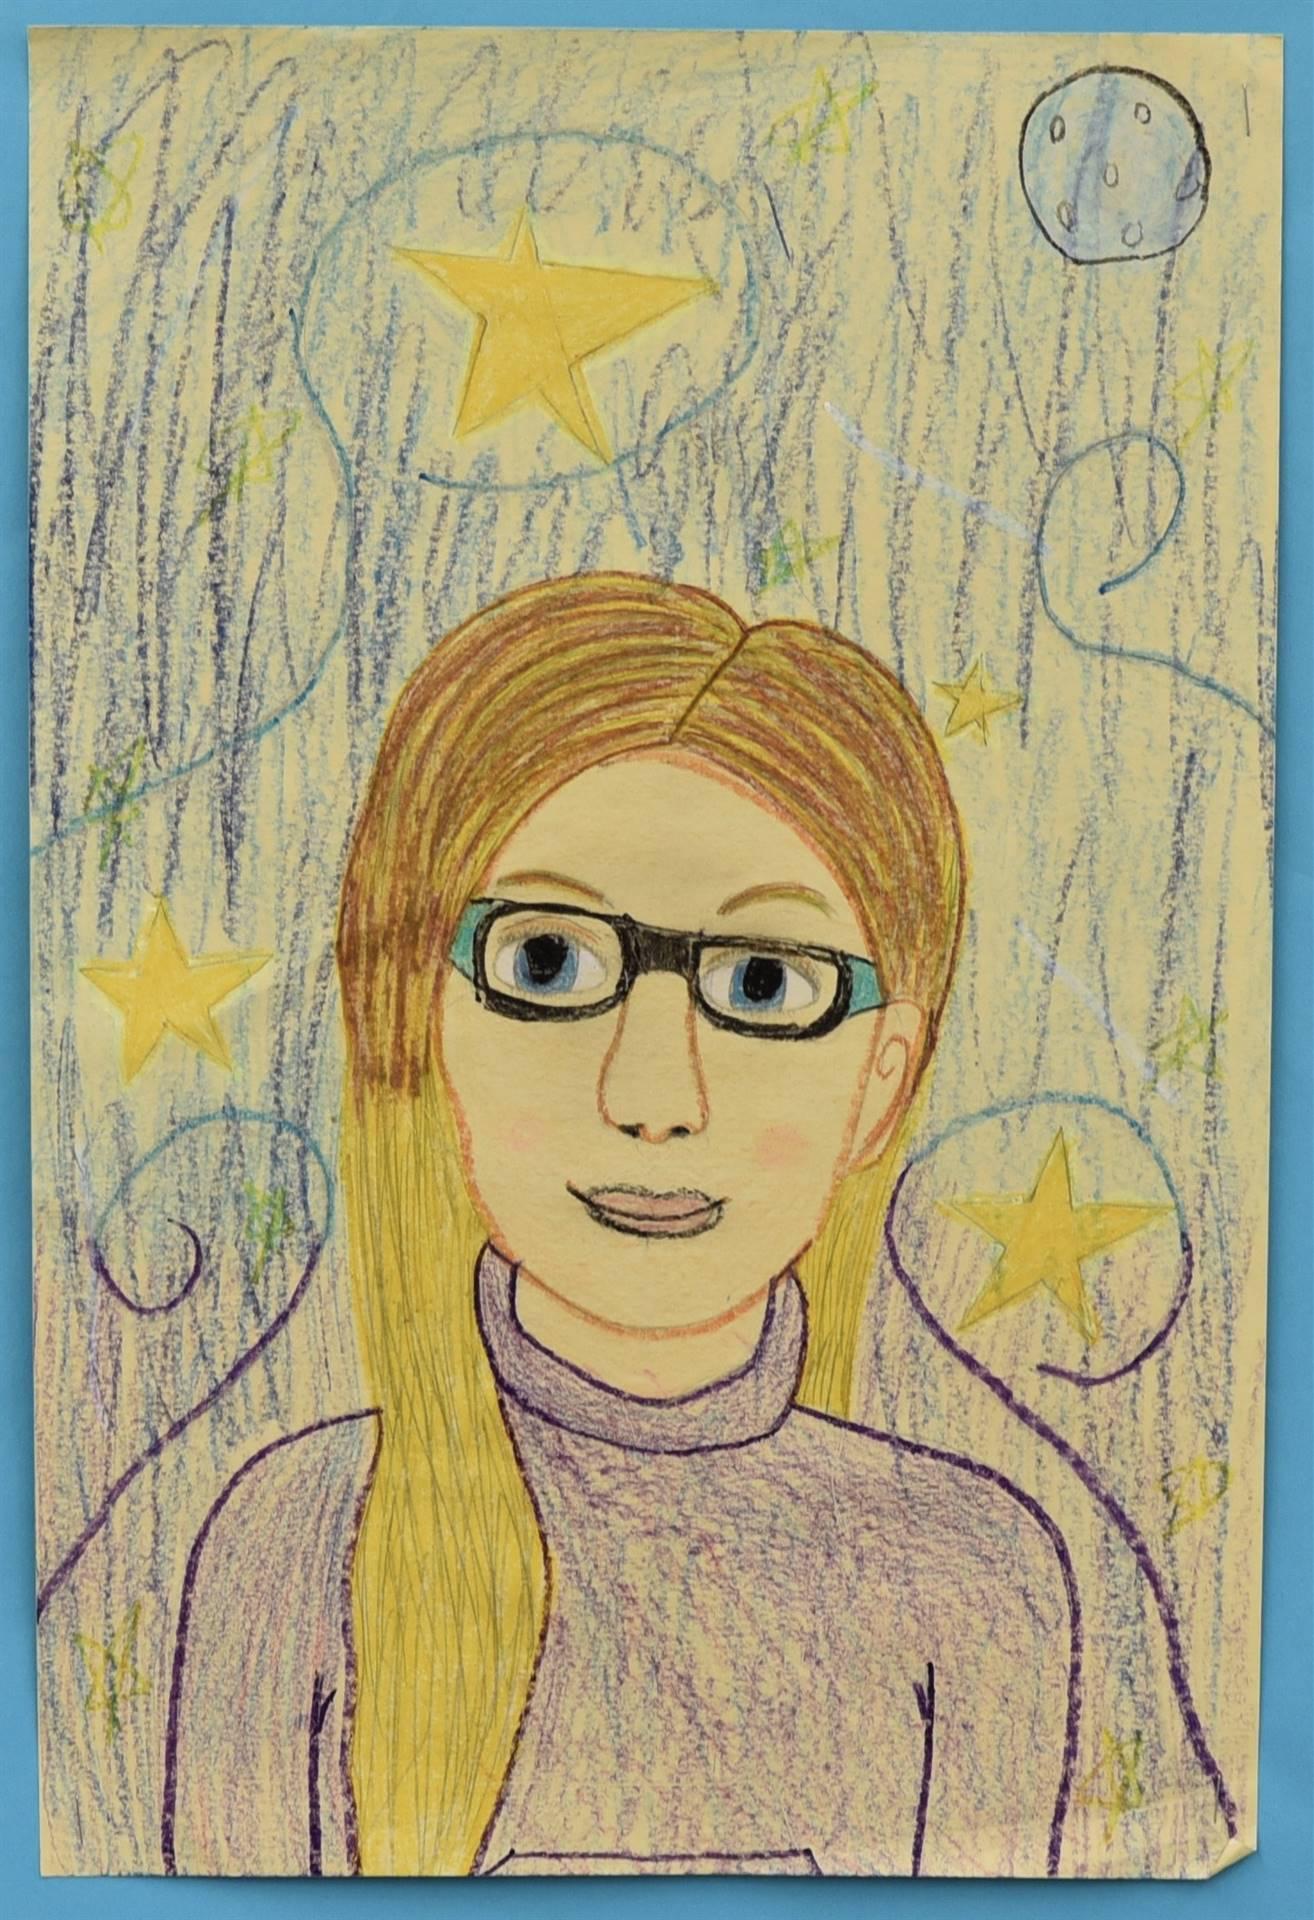 Brecksville-Broadview Hts. Middle School Art Projects 183